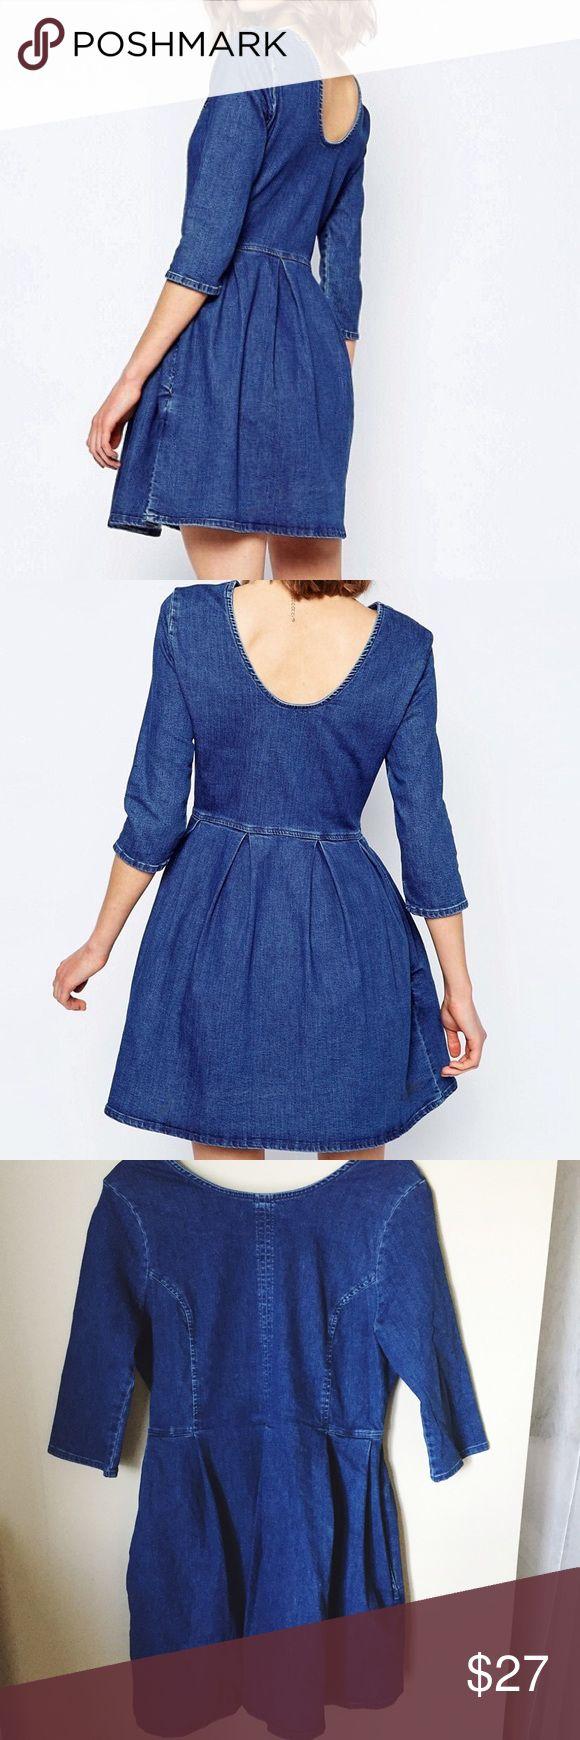 ASOS denim skater dress for petite Soooooooo cute! Just a little big on me now. The pockets kill me. Great for the petite gals ❤️ ASOS Dresses